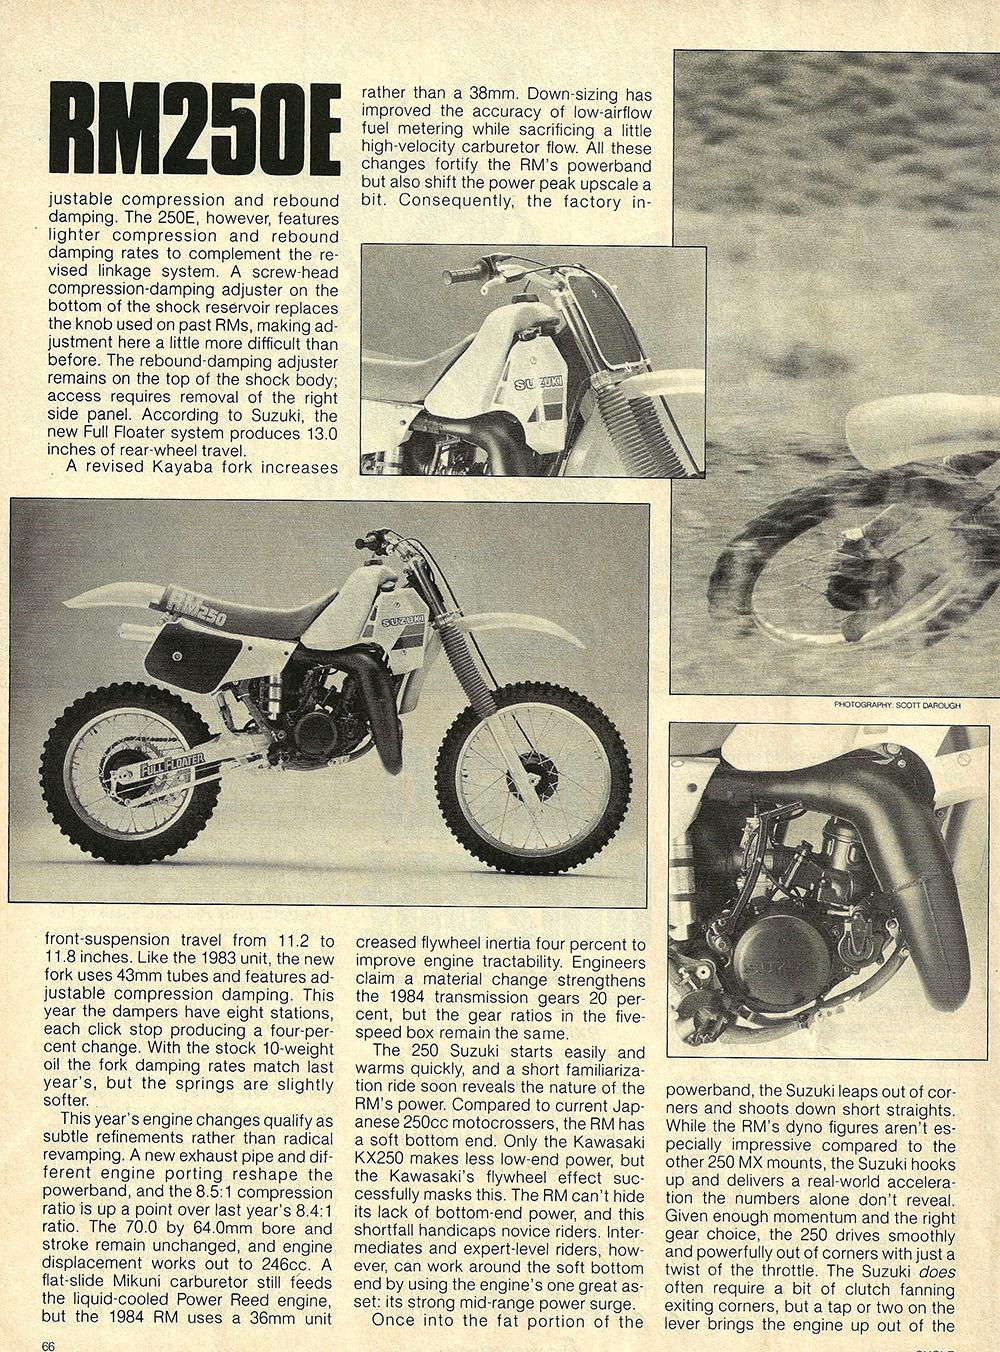 1984 Suzuki RM250 E road test 02.jpg